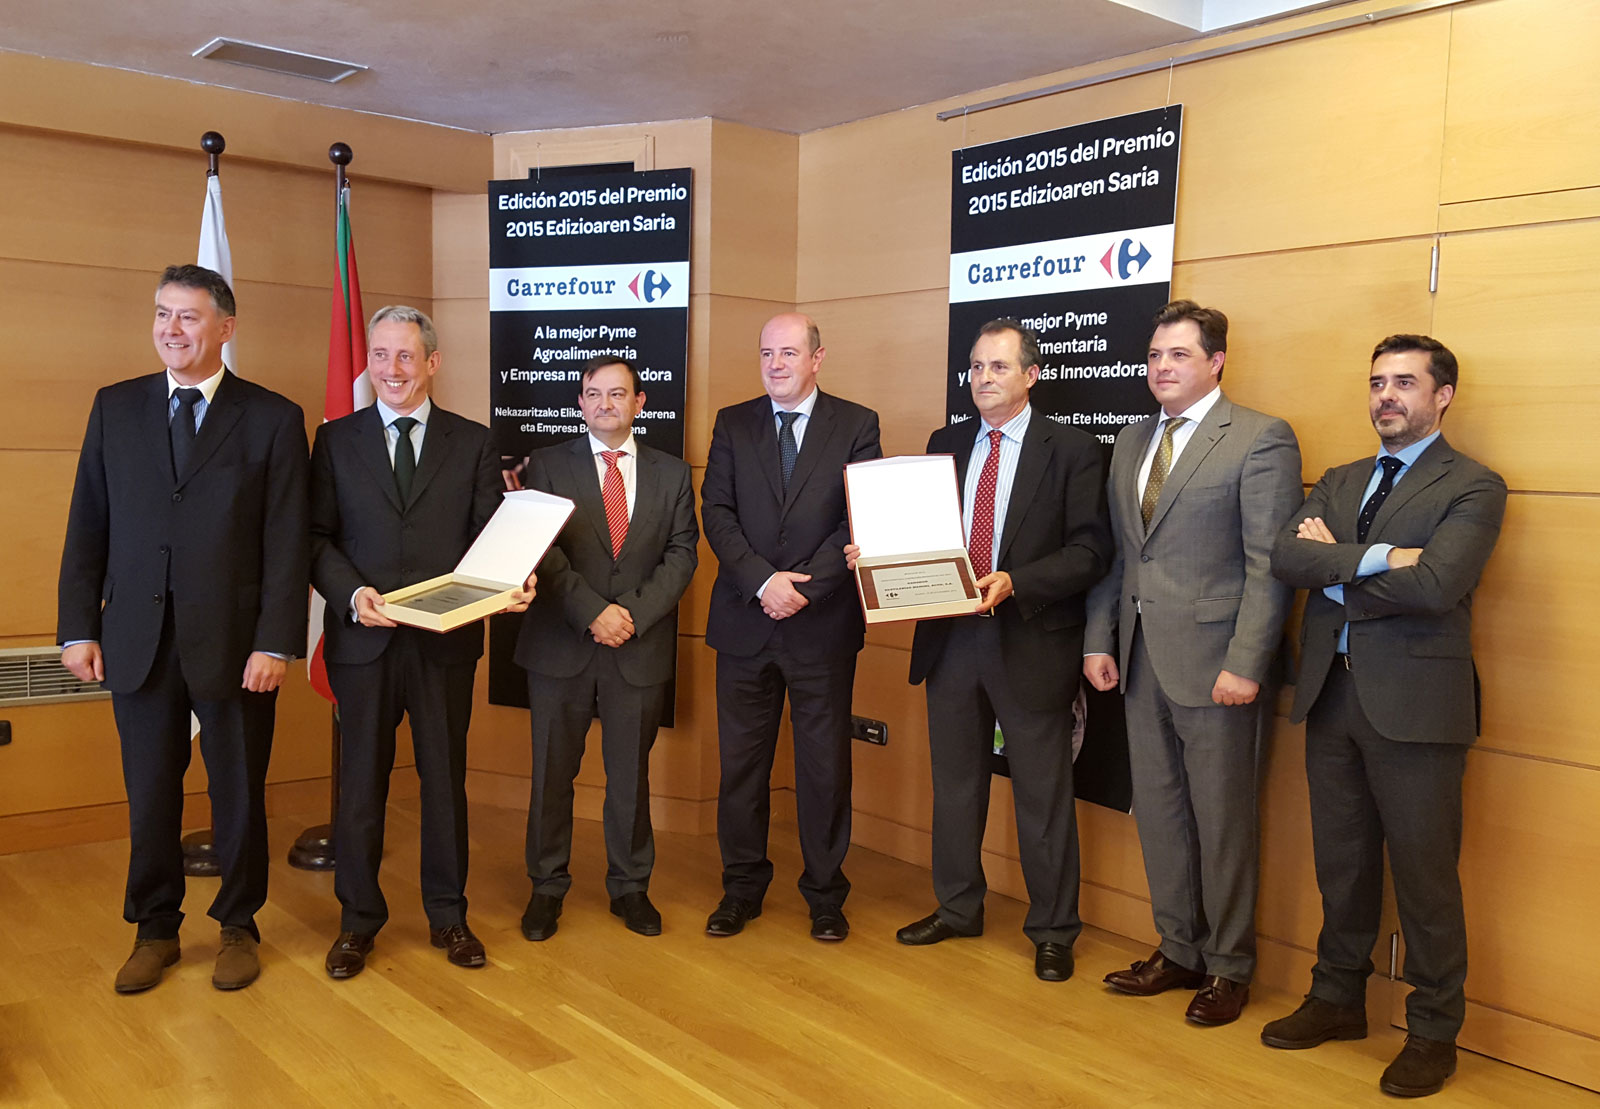 premios_carrefour2015.jpg